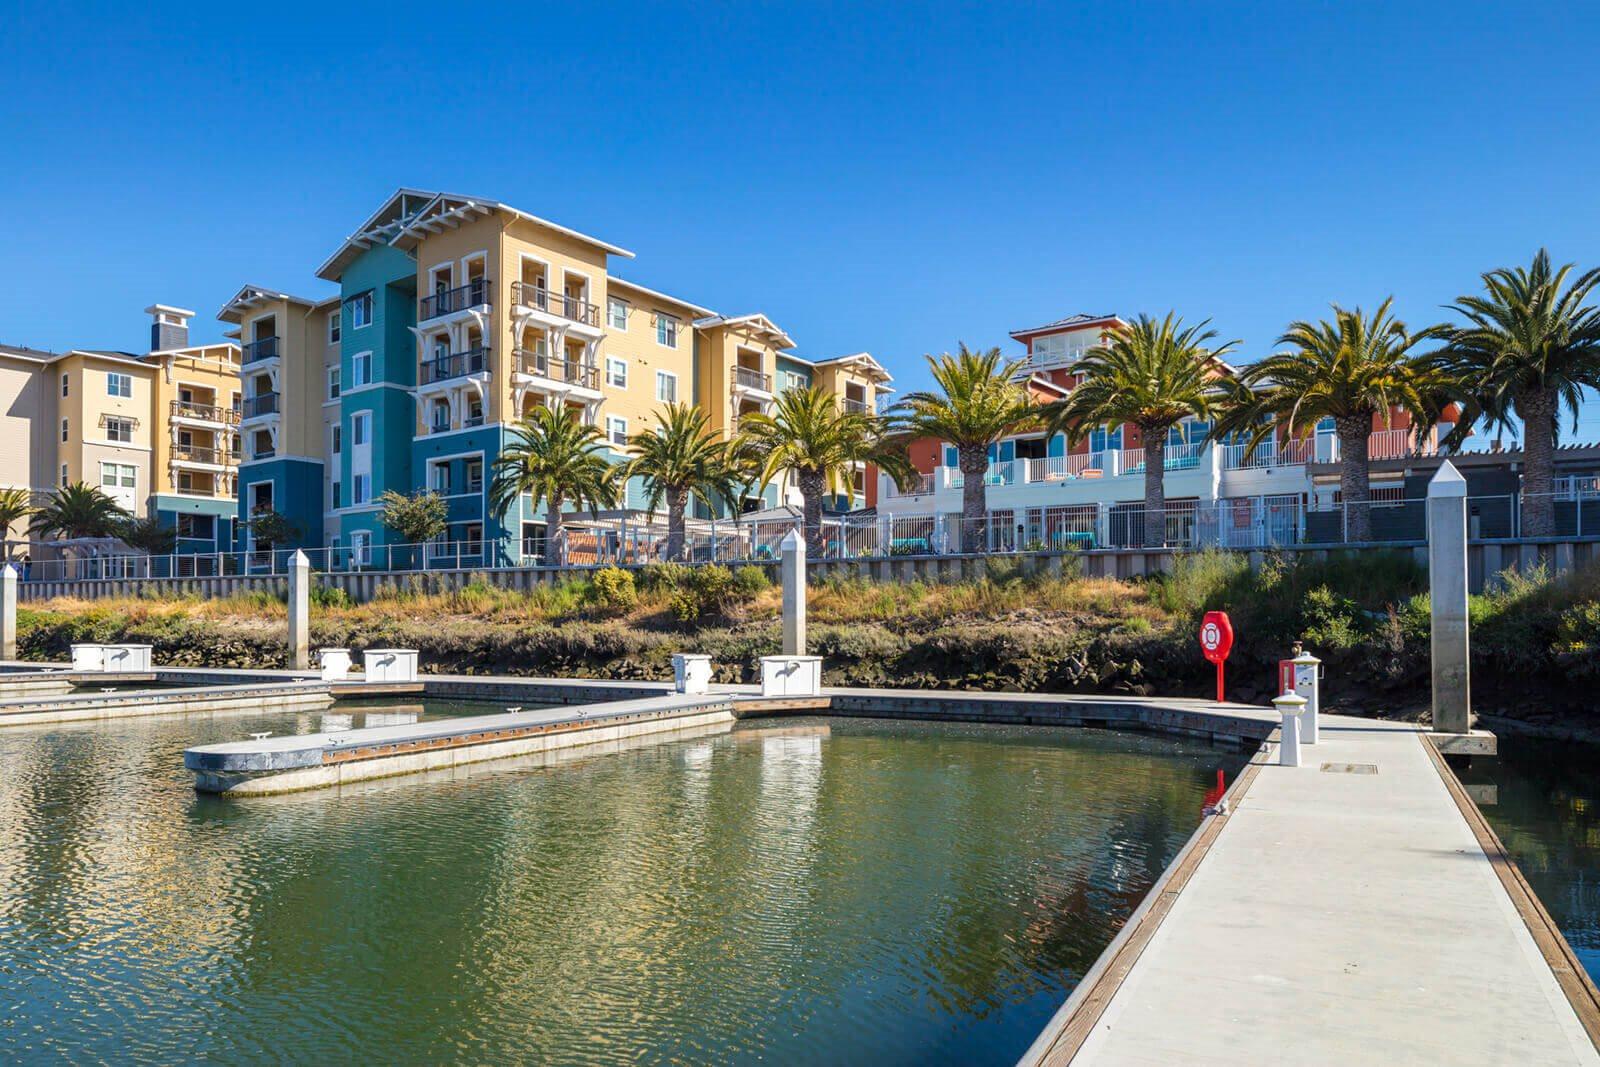 Coastal Retreat Homes at Blu Harbor by Windsor, Redwood City, CA